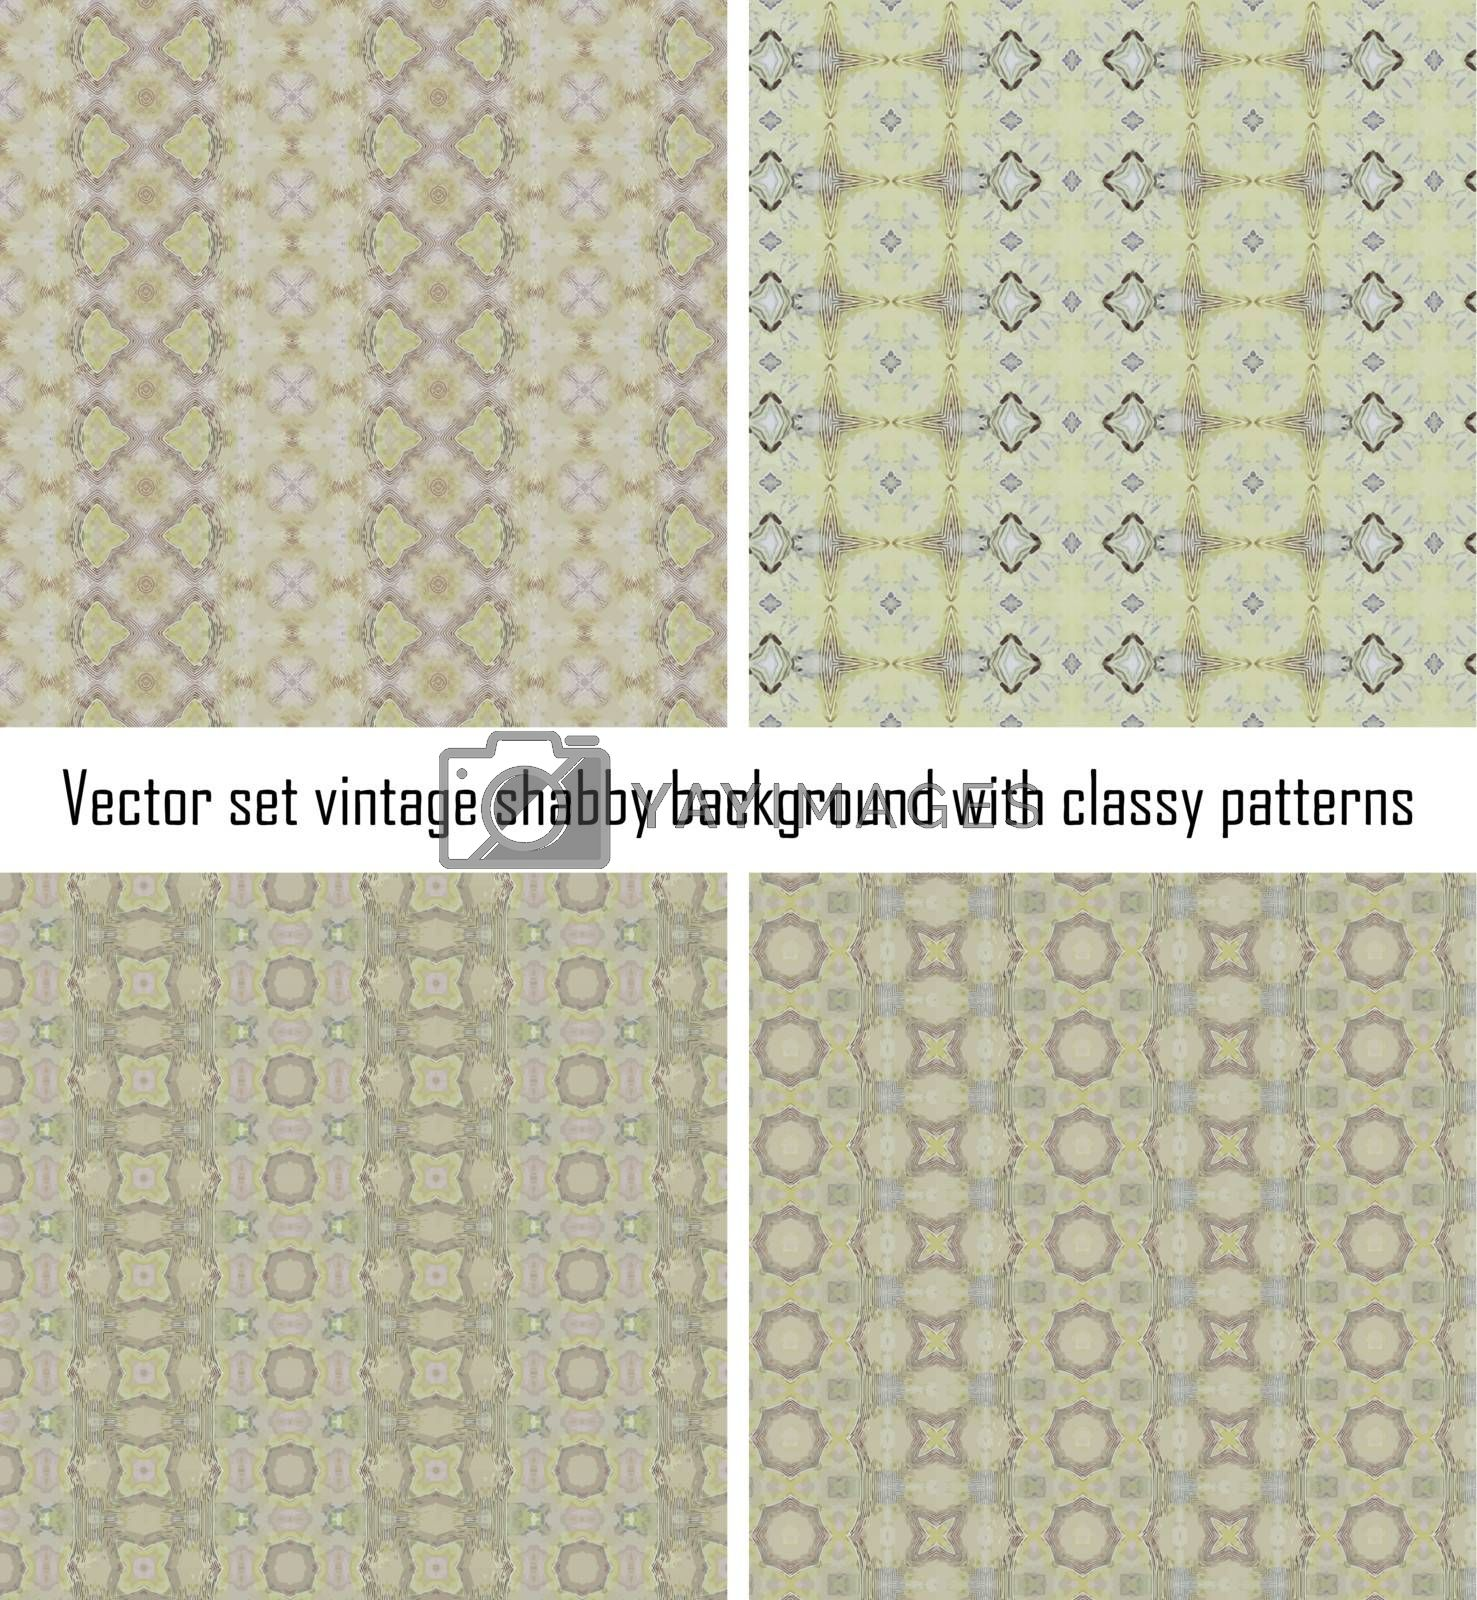 Set vintage shabby background with classy patterns by H2Oshka